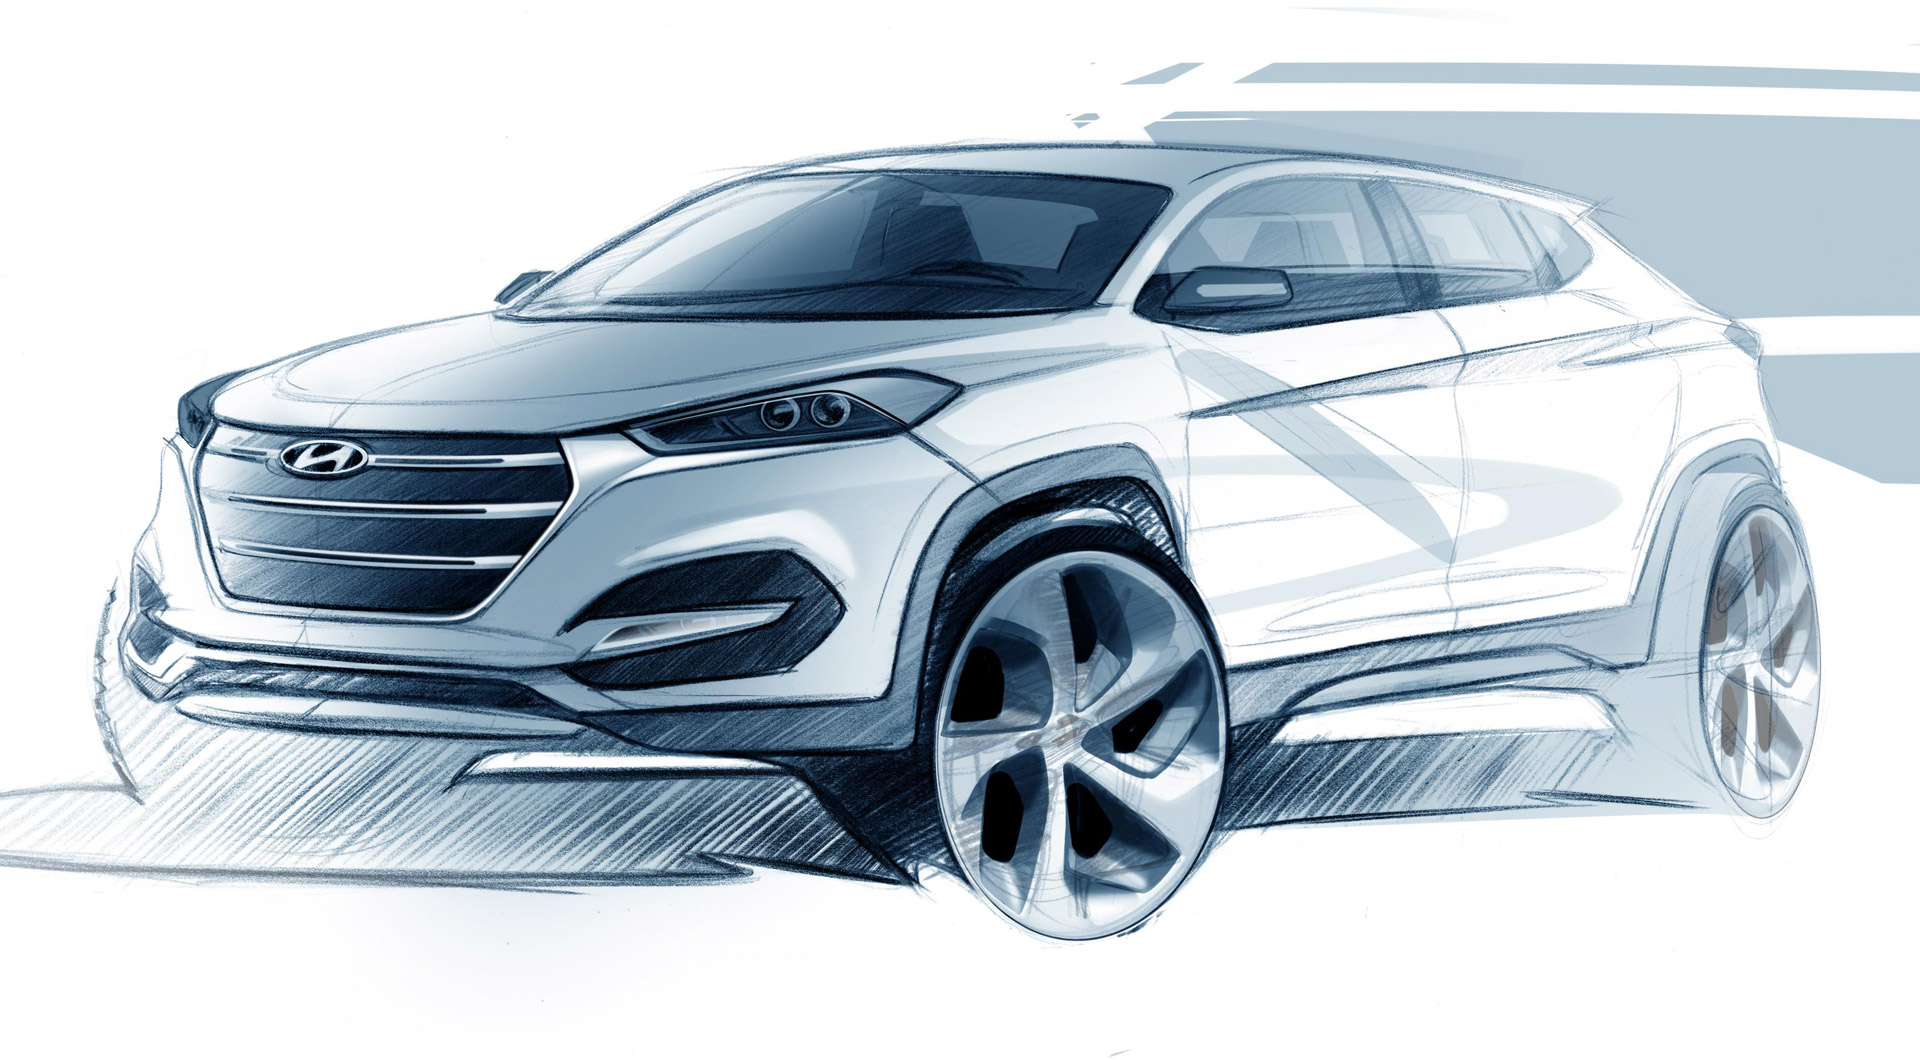 2016 Hyundai Tucson Teased Ahead Of 2015 Geneva Motor Show